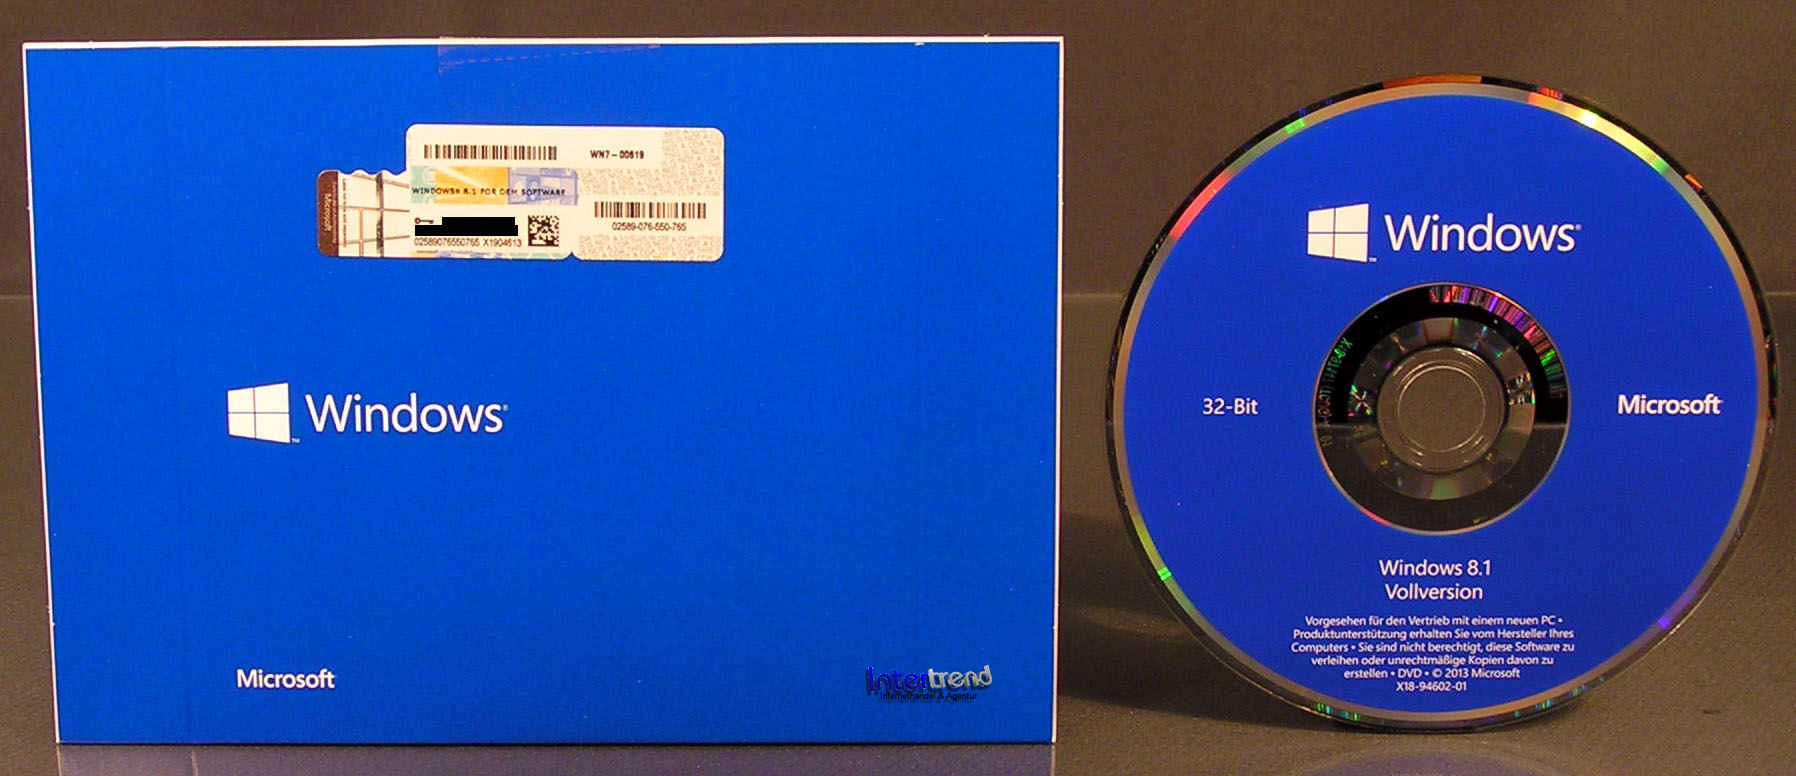 Jual Paket Instalasi Windows 7 Win 8 10 Driver Pack 14 Dvd Instal Ulang Komputer Laptop Office K Software Tokopedia